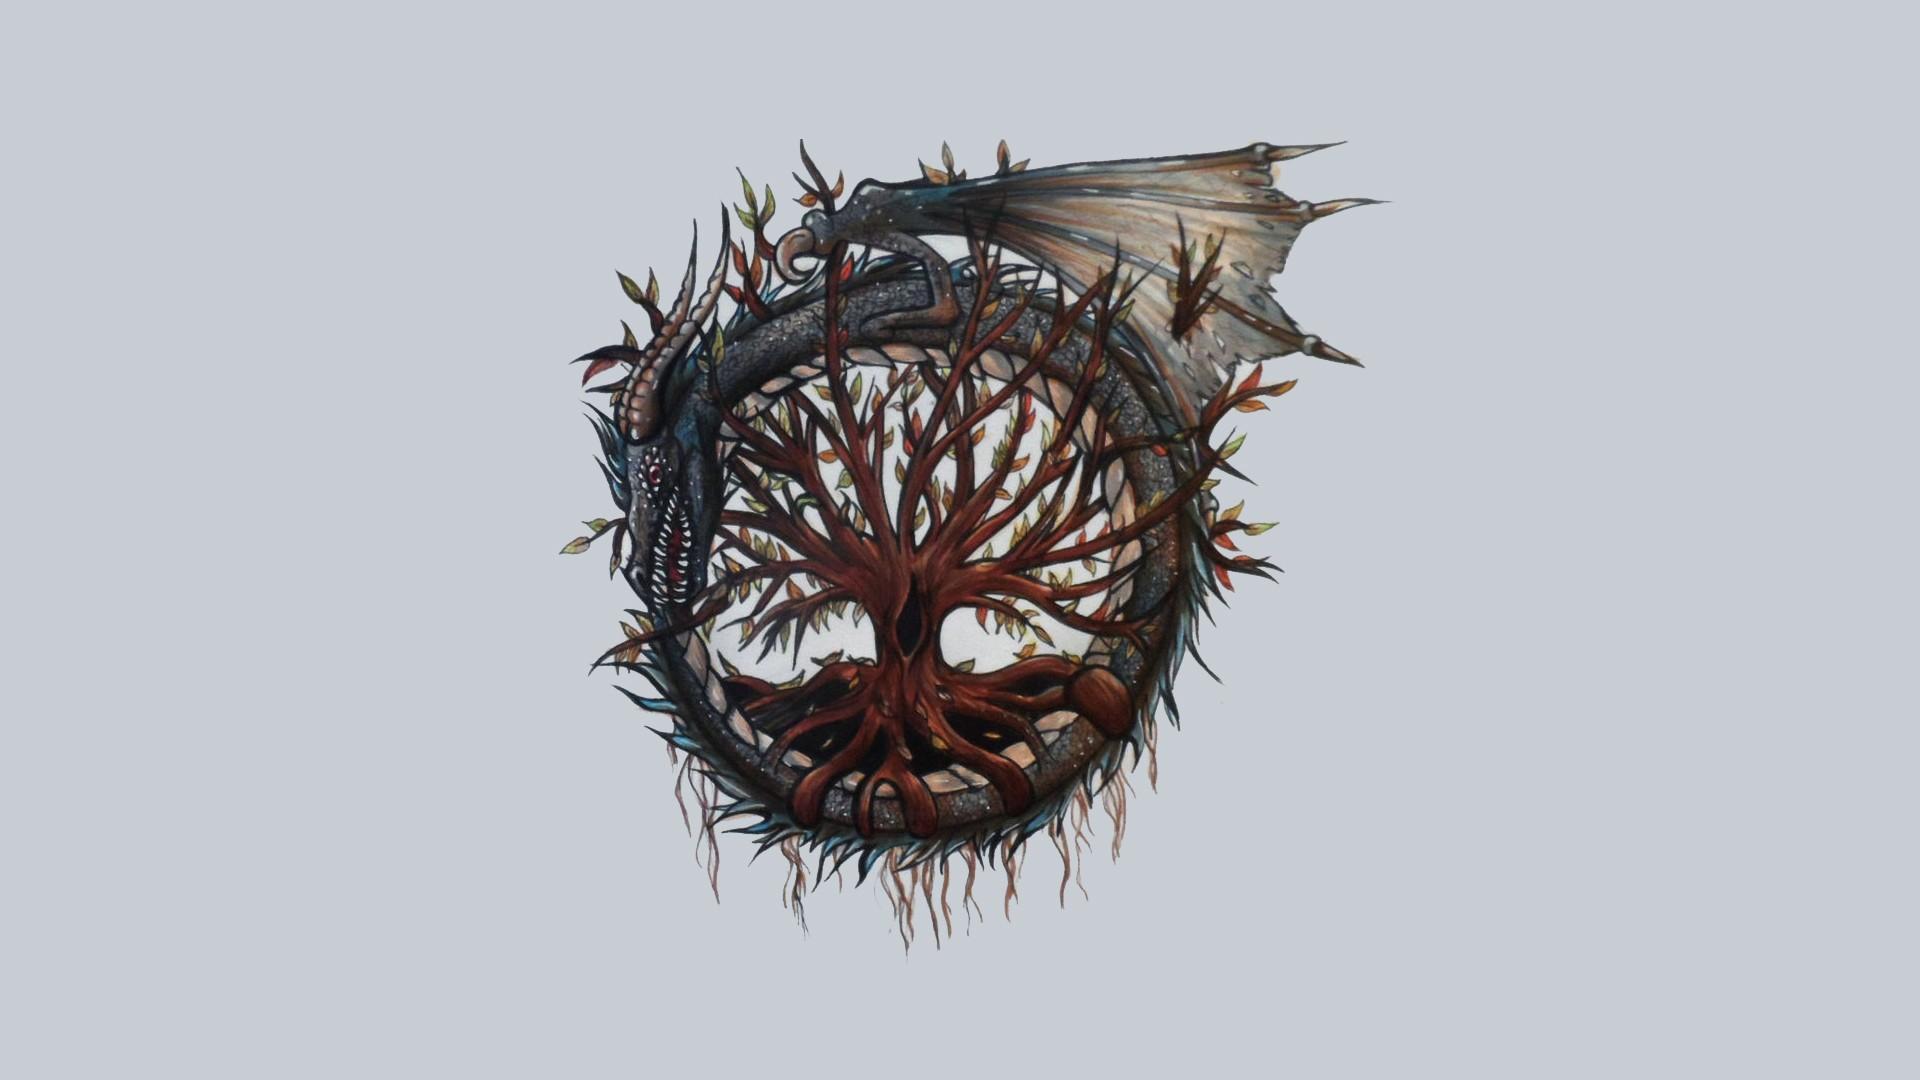 Download-hd-of-digital-Art-Minimalism-Trees-Branch-Roots-Dragon-Circle-Celt-wallpaper-wp3404862